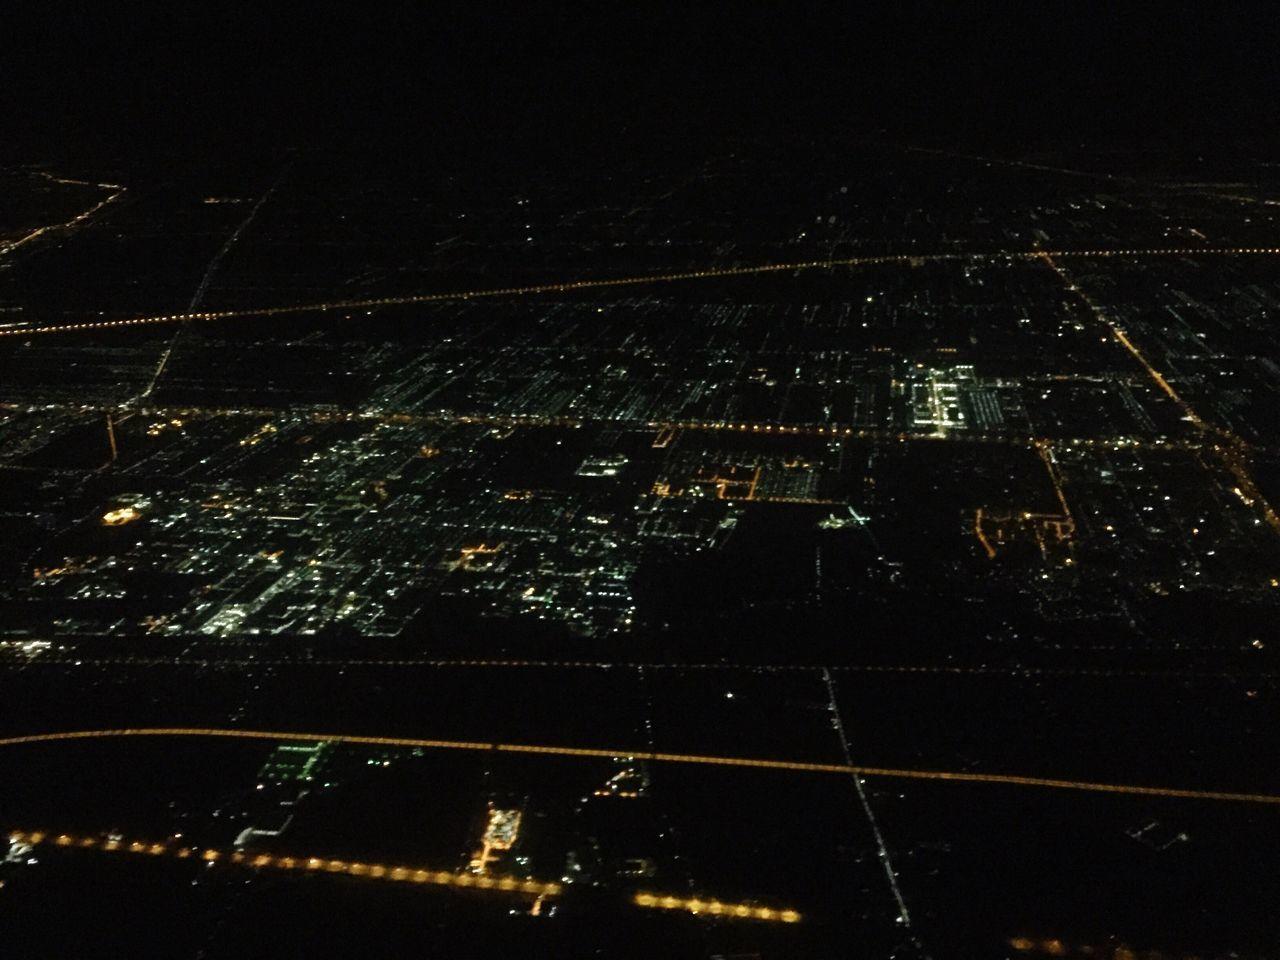 Illuminated City Night City Lights Looking Down